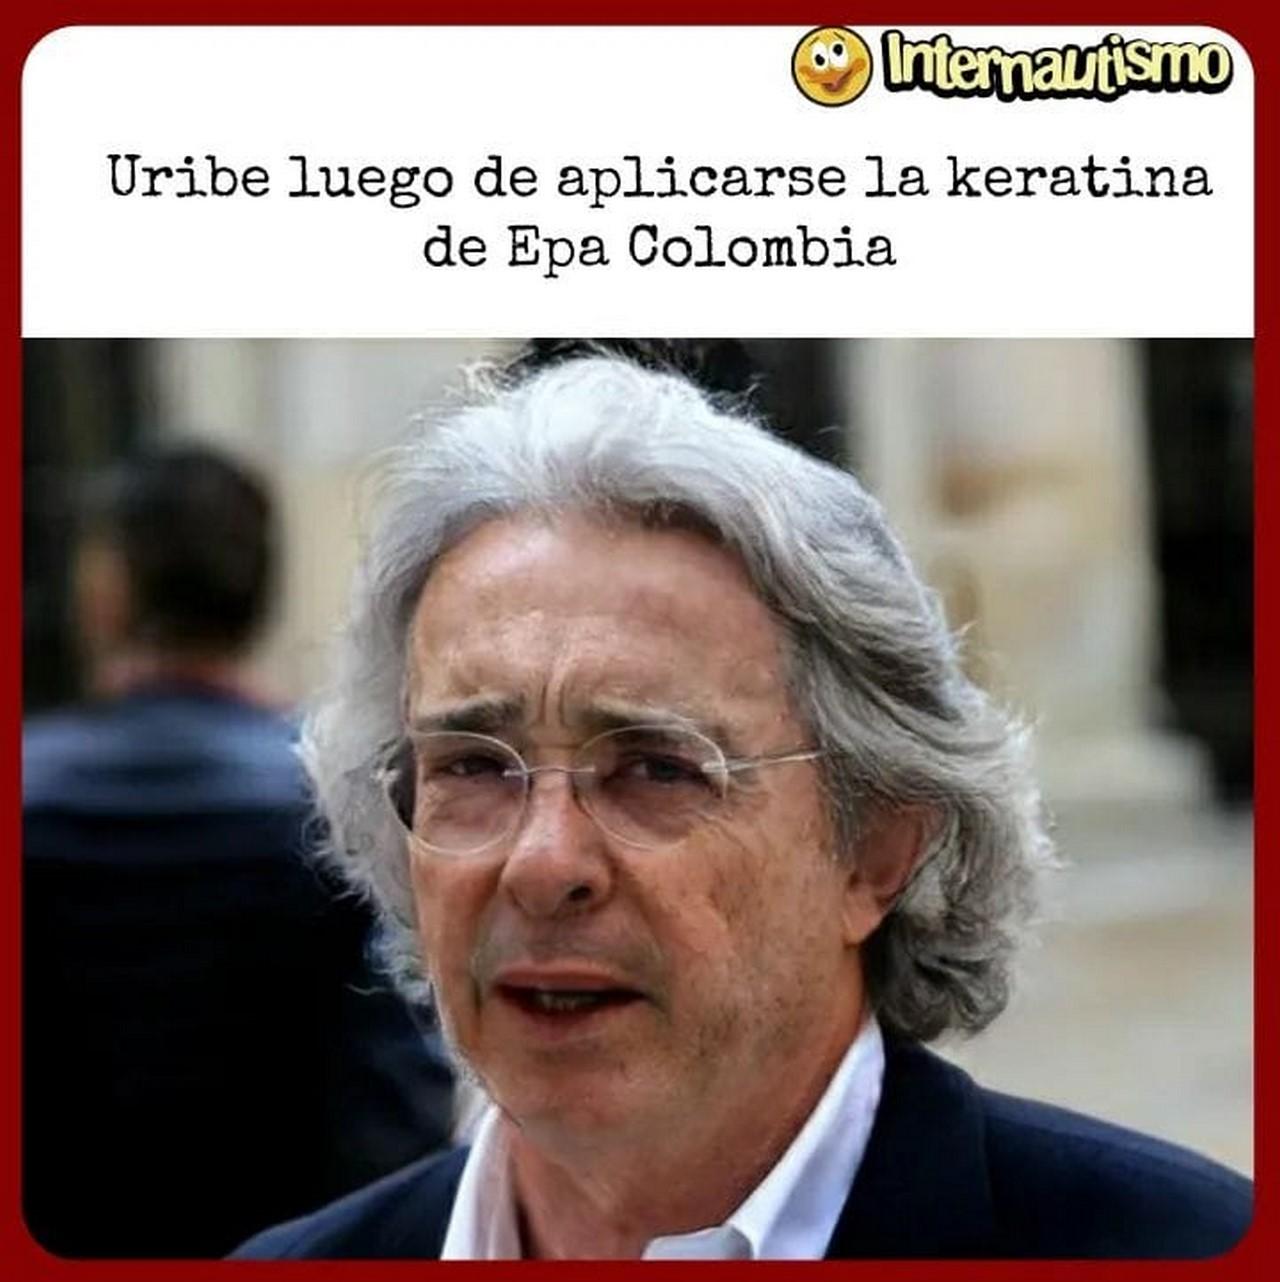 memes epa colombia 2021 uribe4